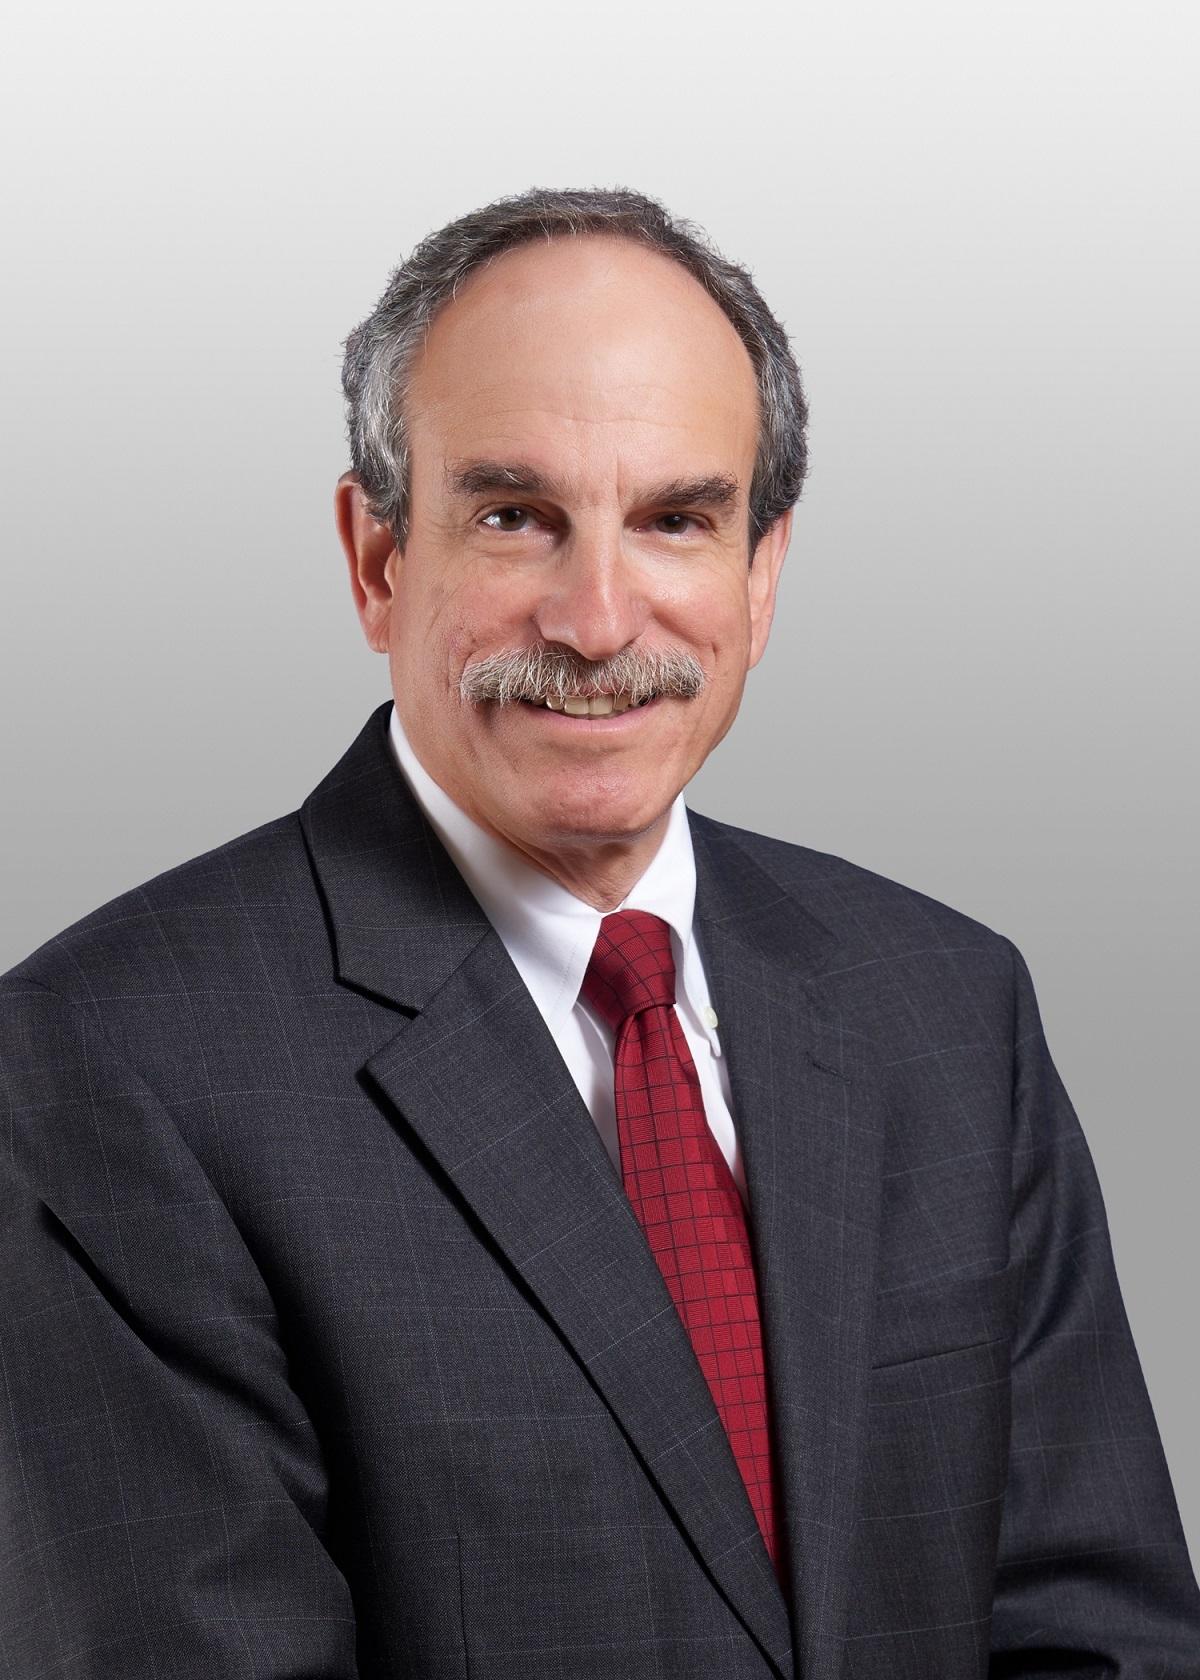 Photo of Robert Gage